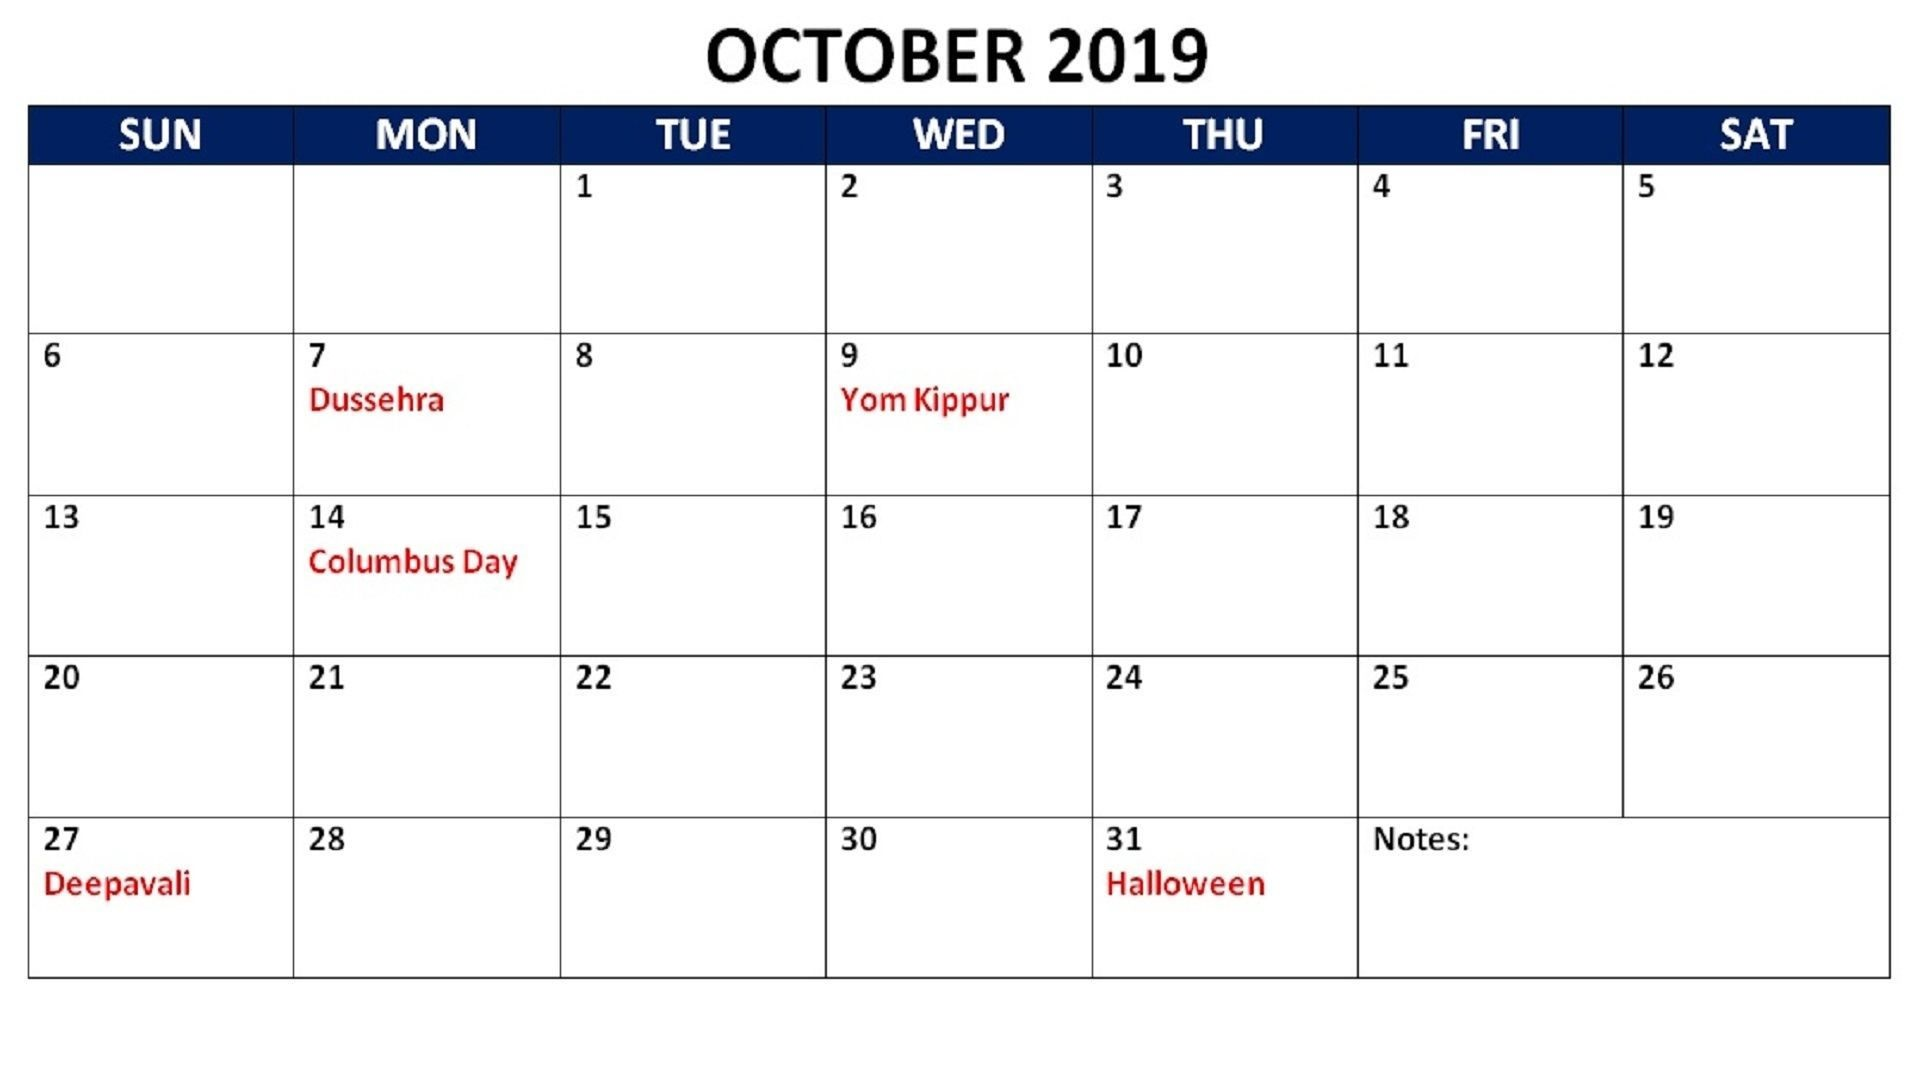 October 2019 Calendar Printable Wallpaper   Printable 1920x1080